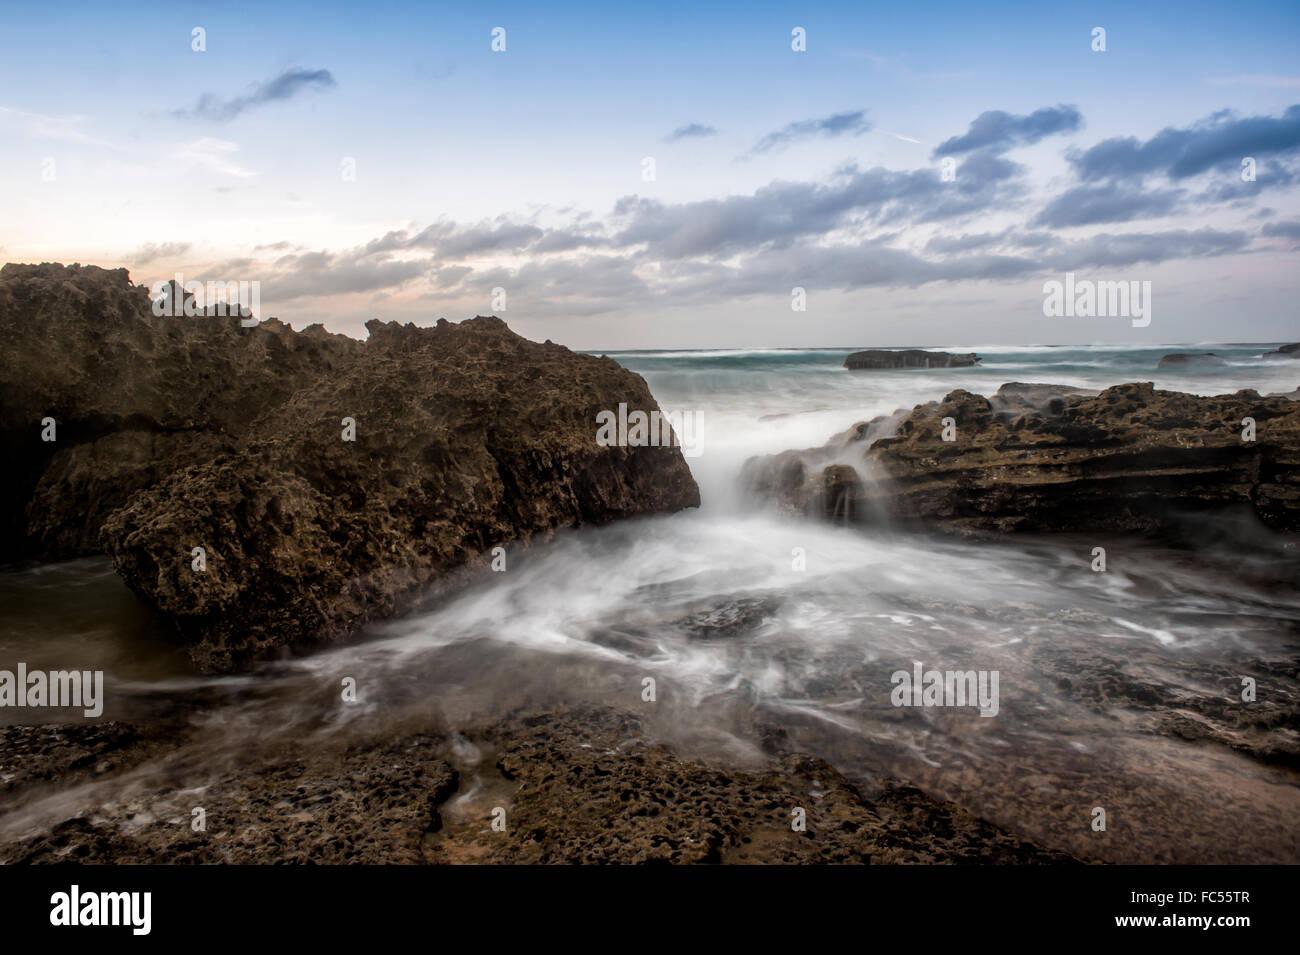 waves on the rocks at Praia do Castelejo - Stock Image